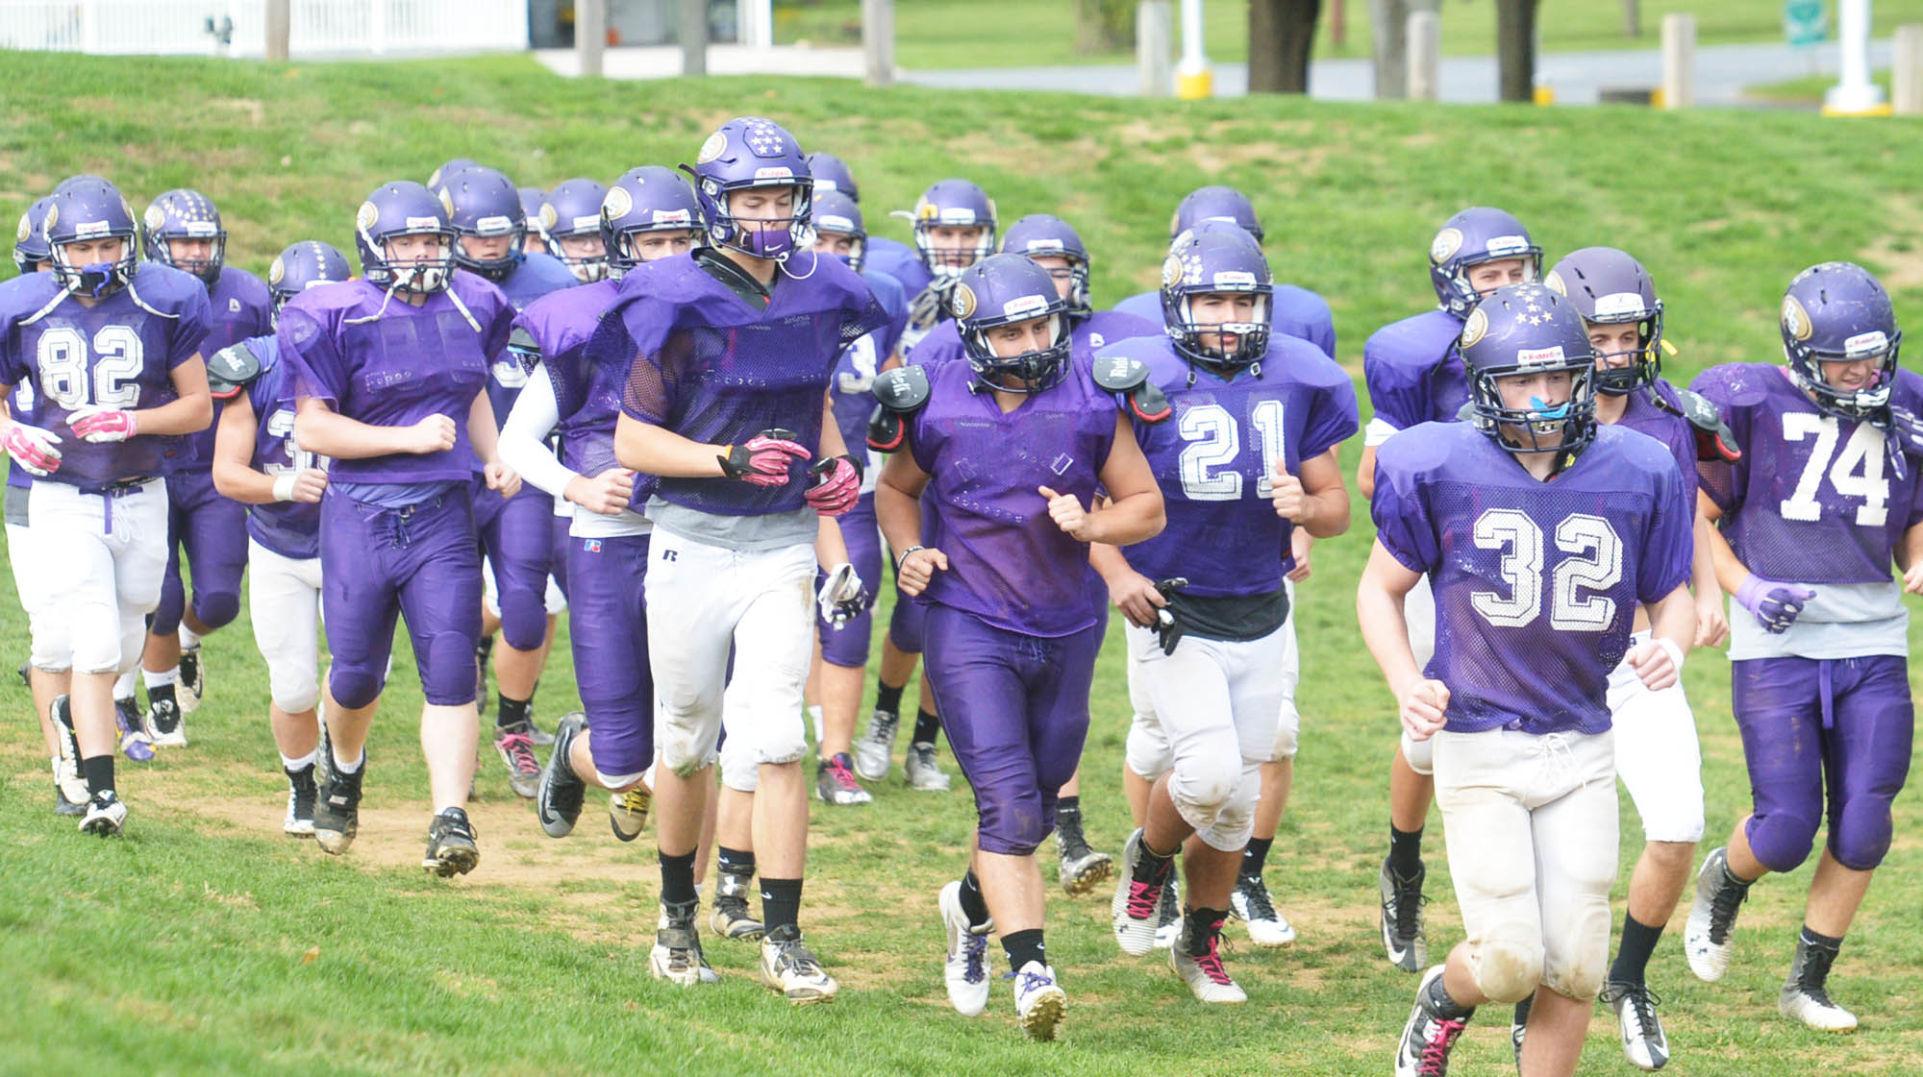 c769531bac6b Hs football local schools weigh in on football helmet discussion football  helmet speedflex cool jpg 1923x1077